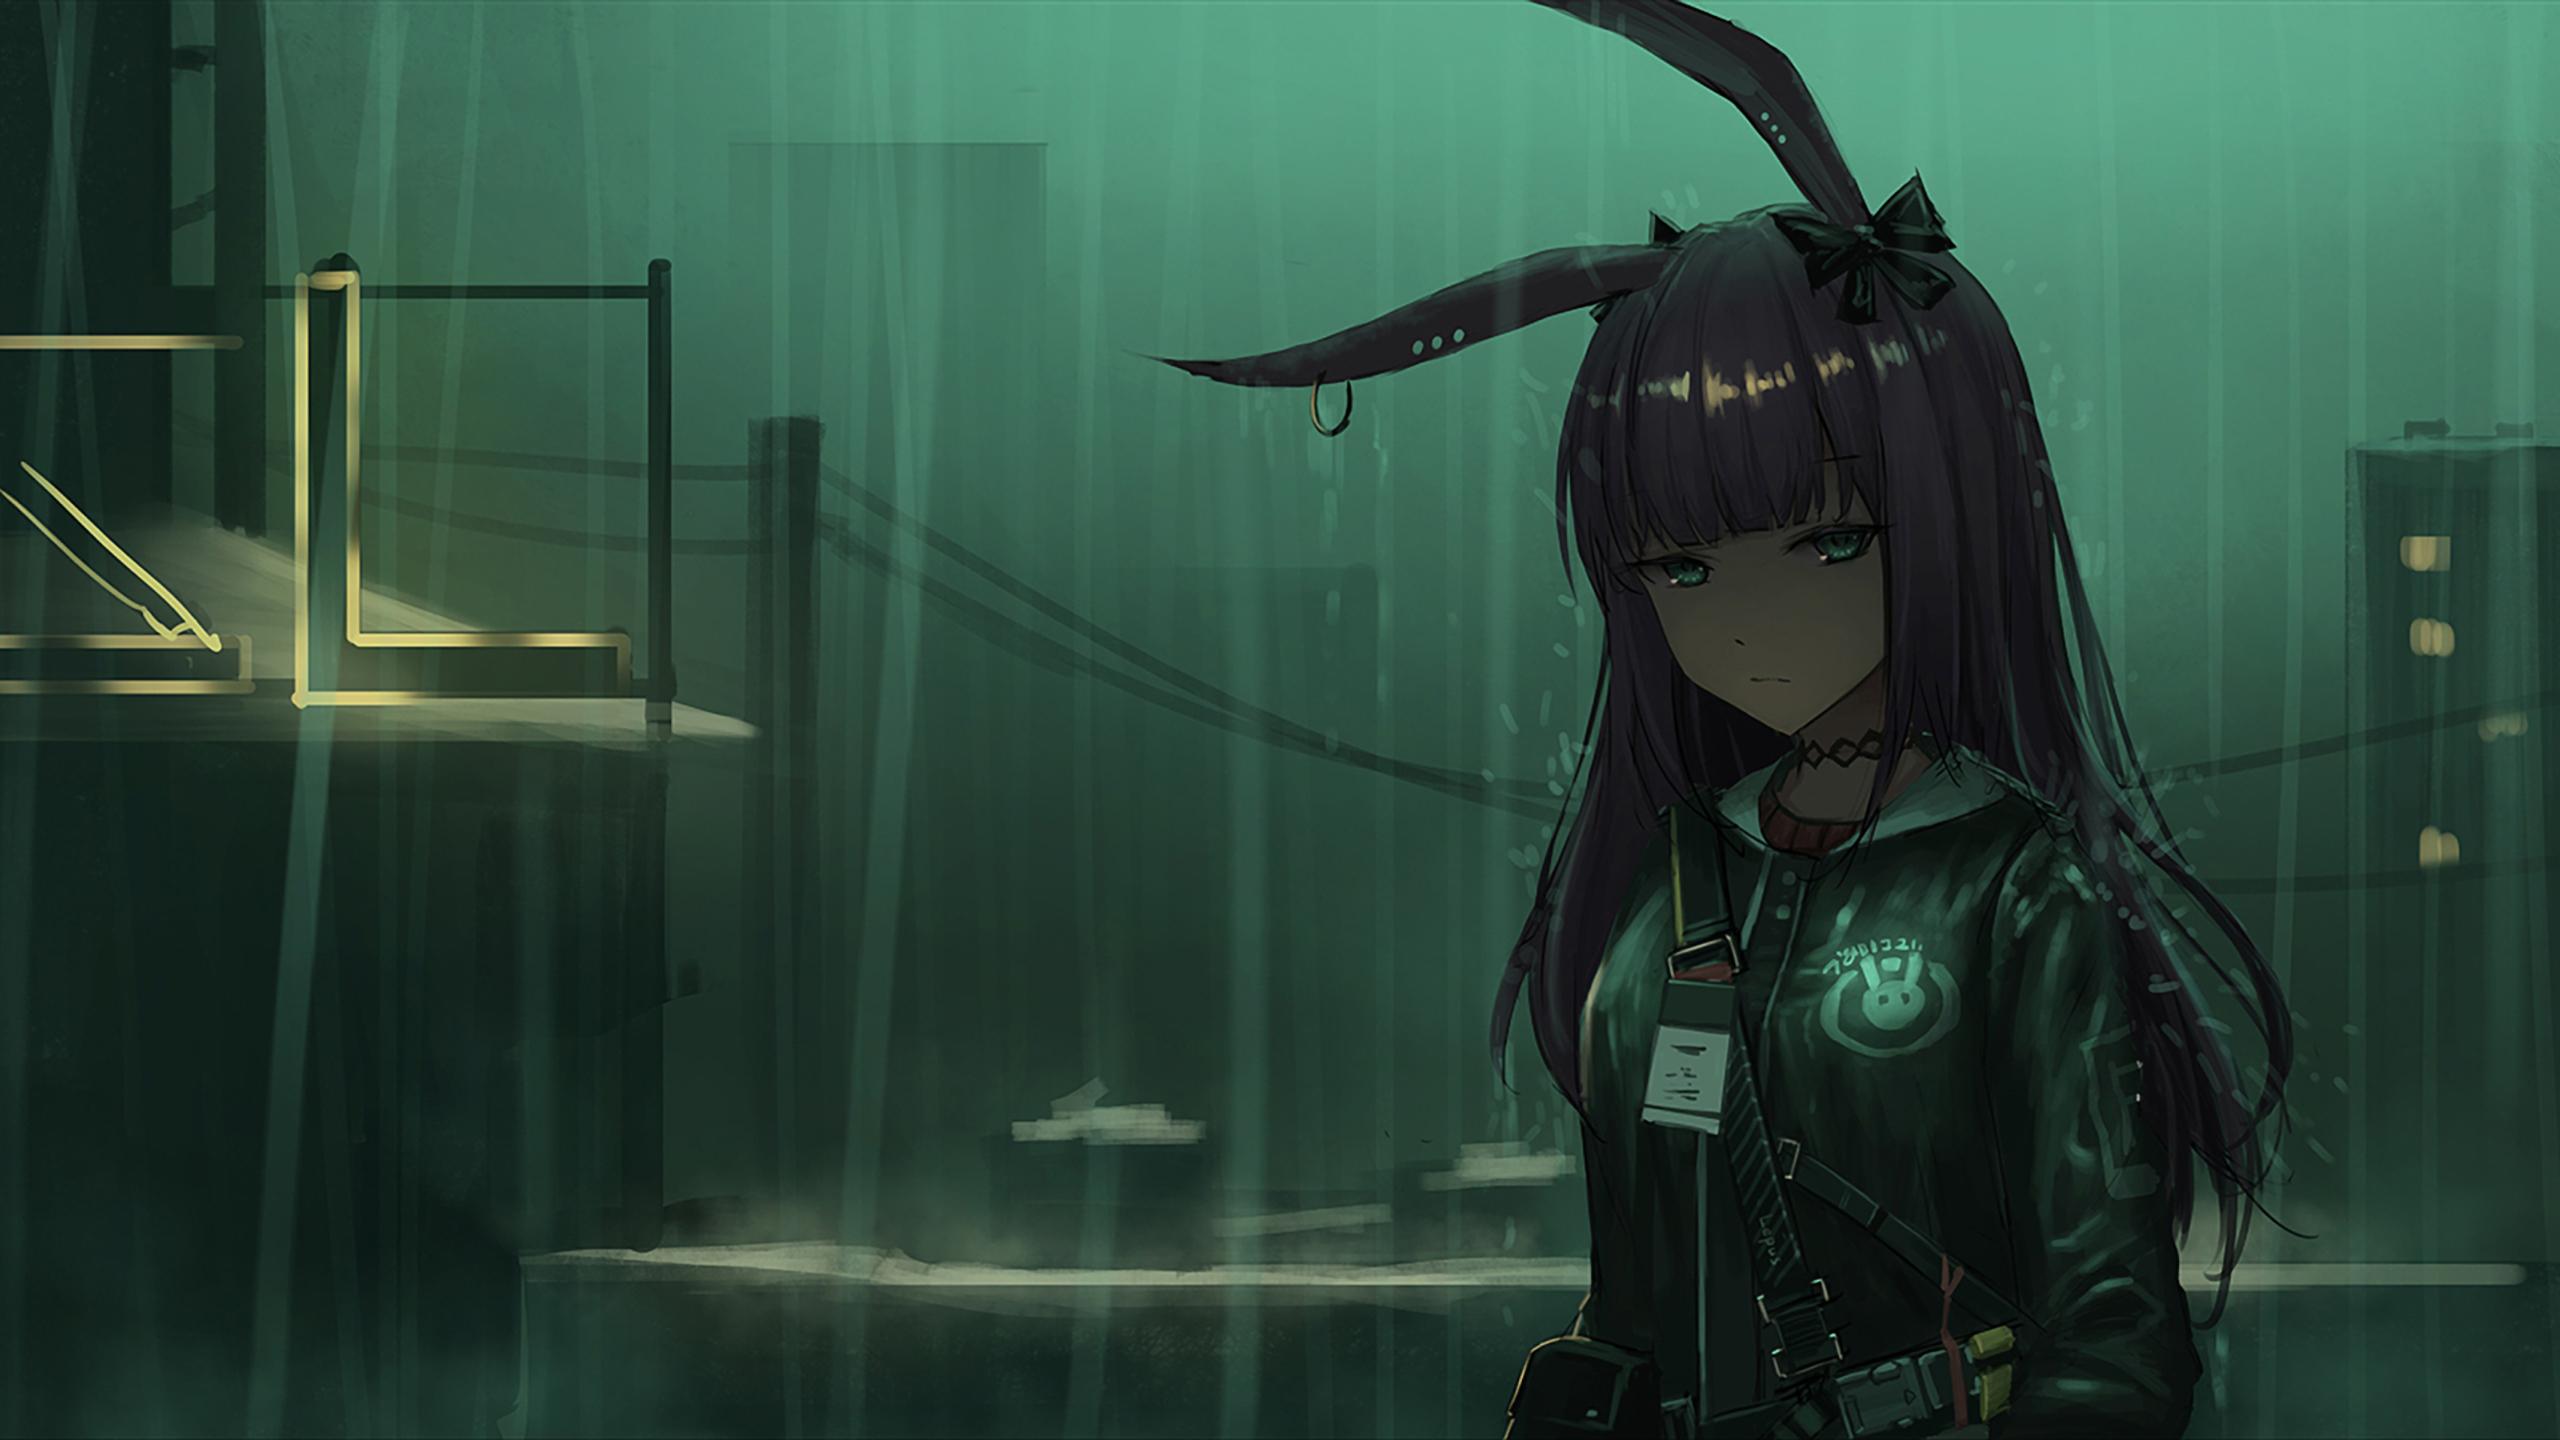 26 1440p Anime Wallpapers